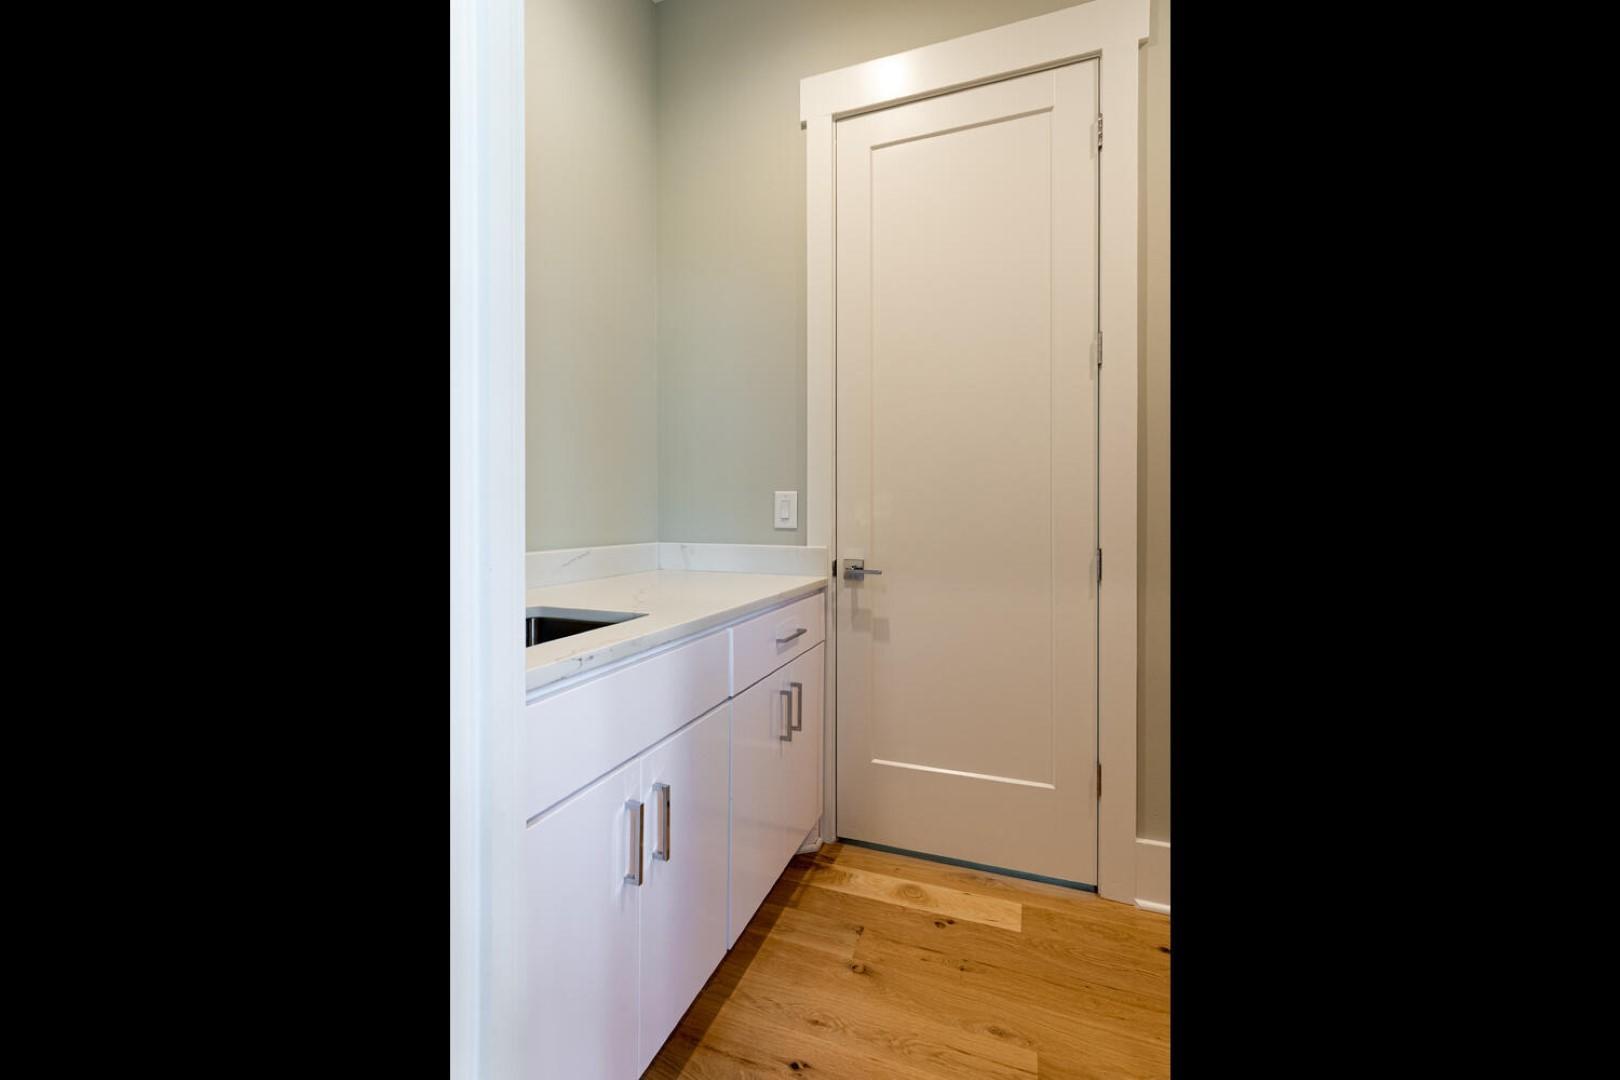 Scanlonville Homes For Sale - 156 5th, Mount Pleasant, SC - 22